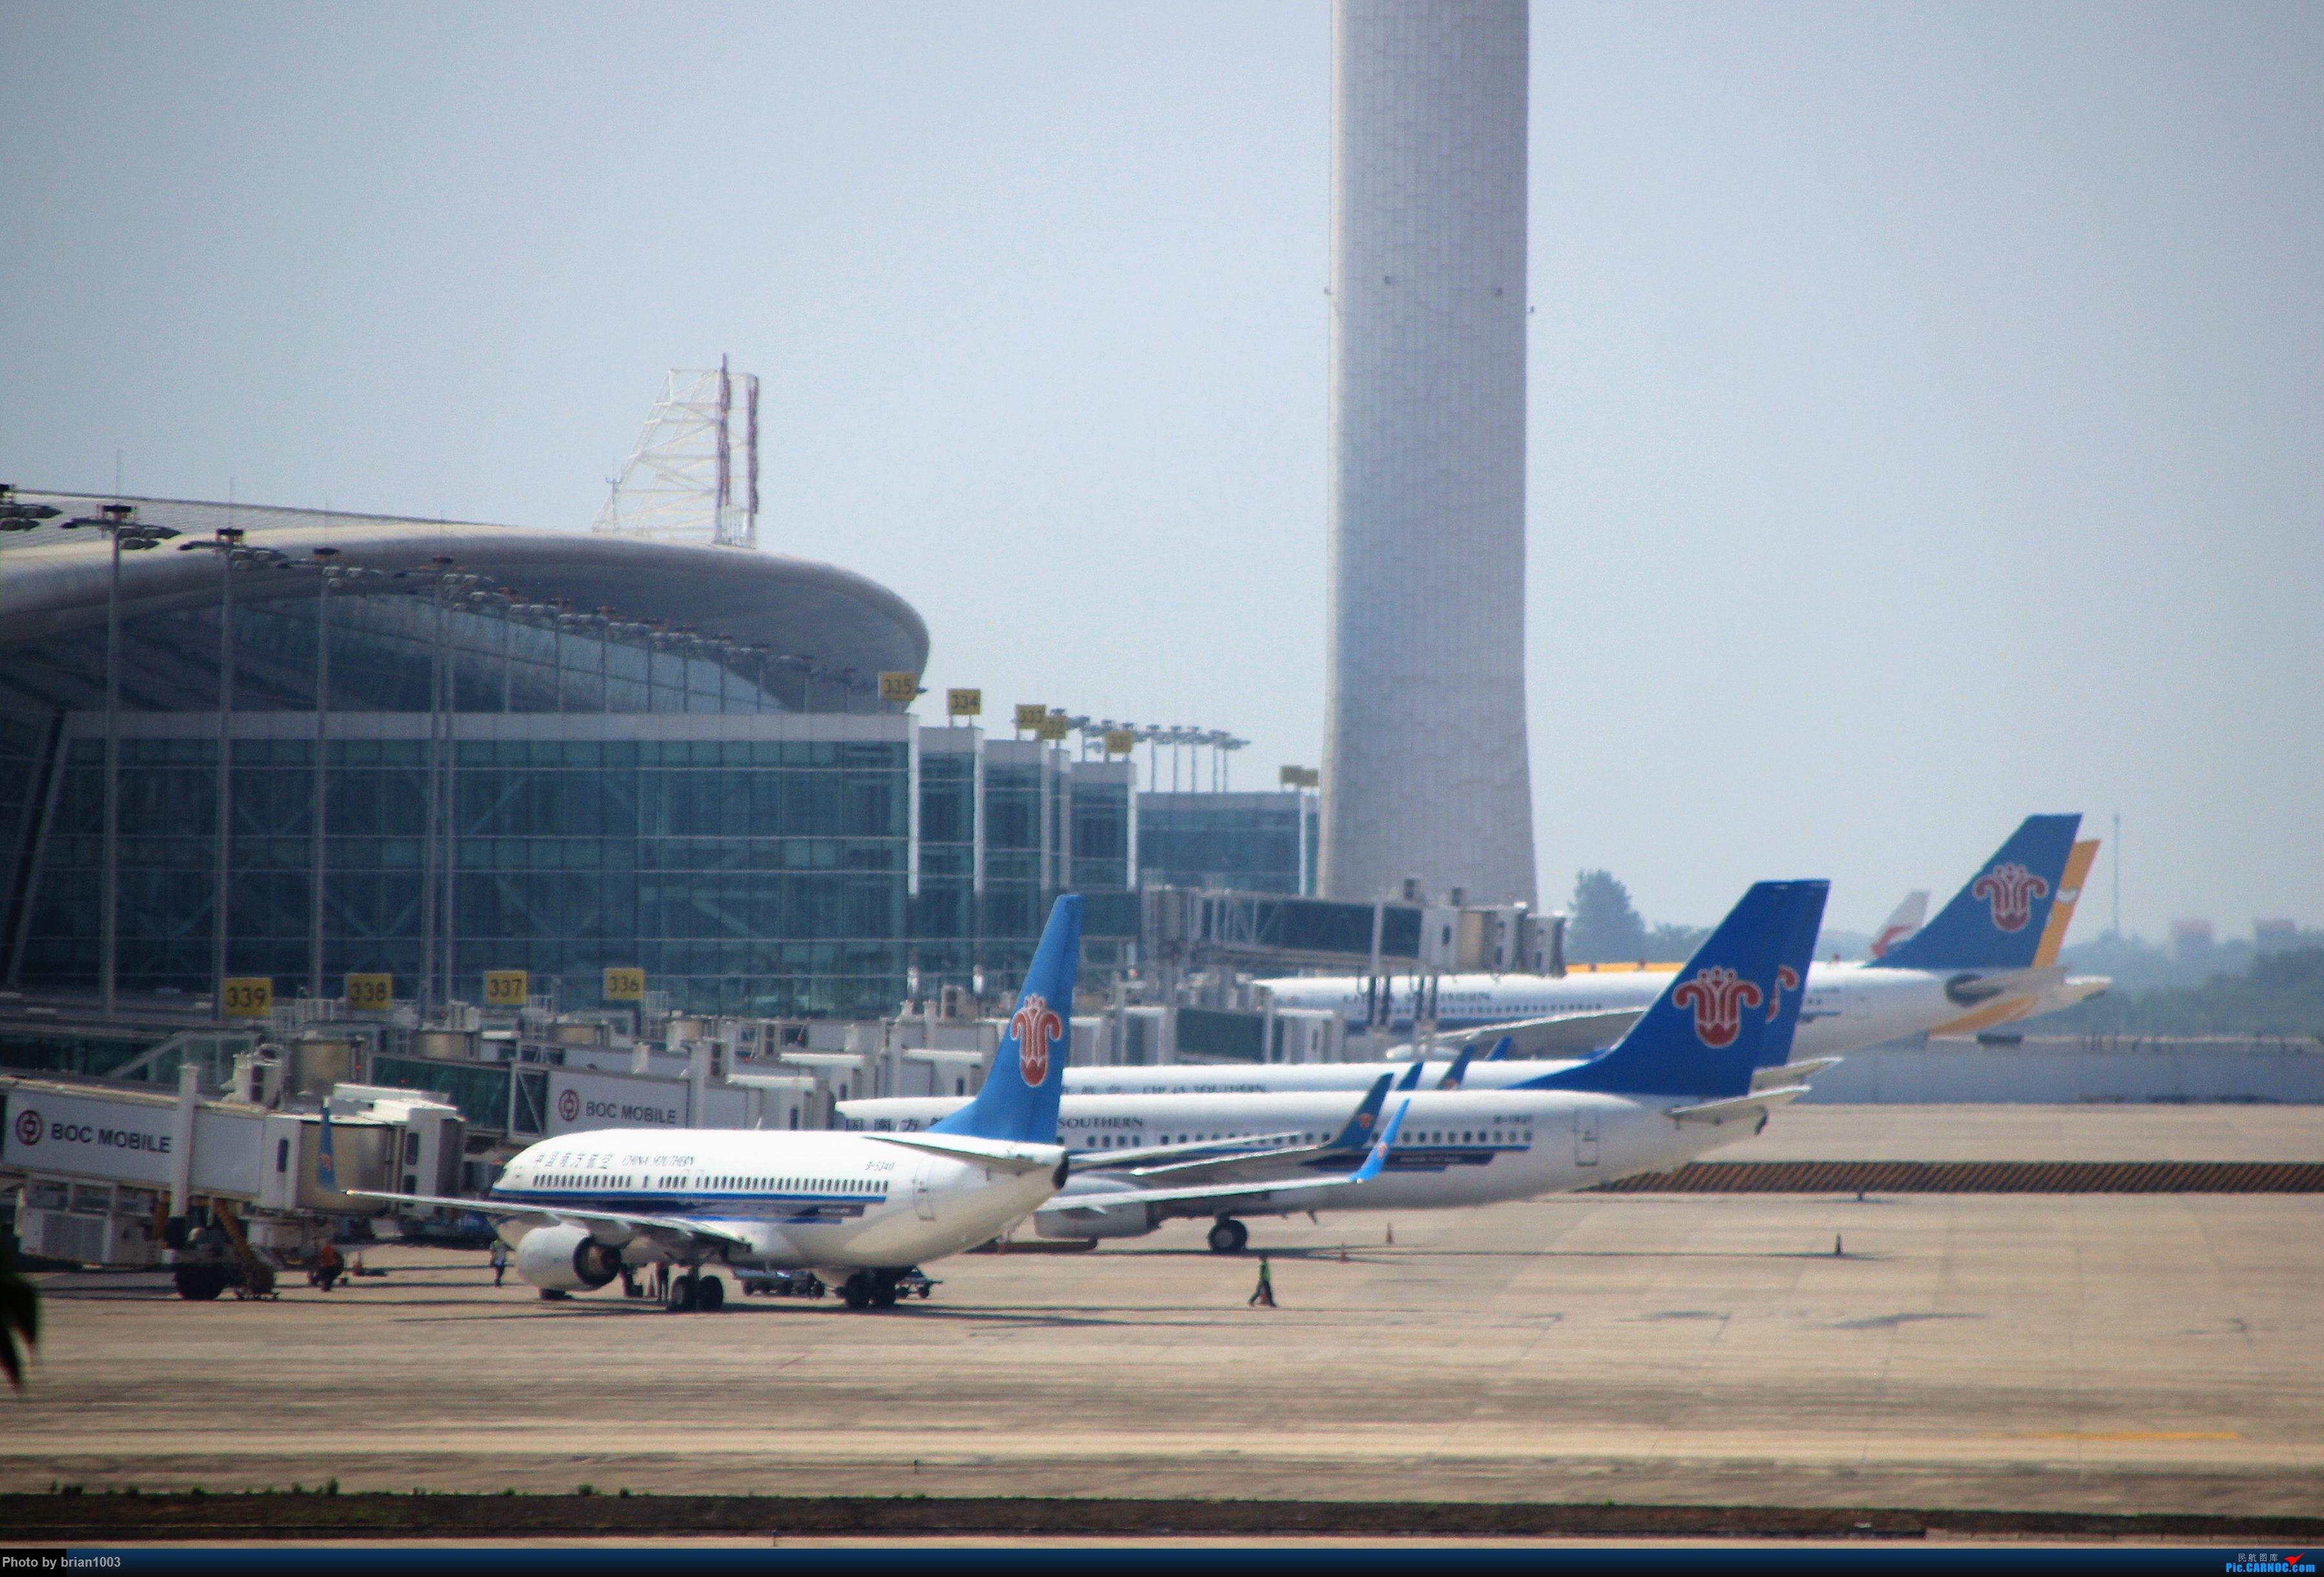 Re:[原创]WUH武汉天河机场拍机之喜迎酷航788和偶遇某其他飞机    中国武汉天河国际机场